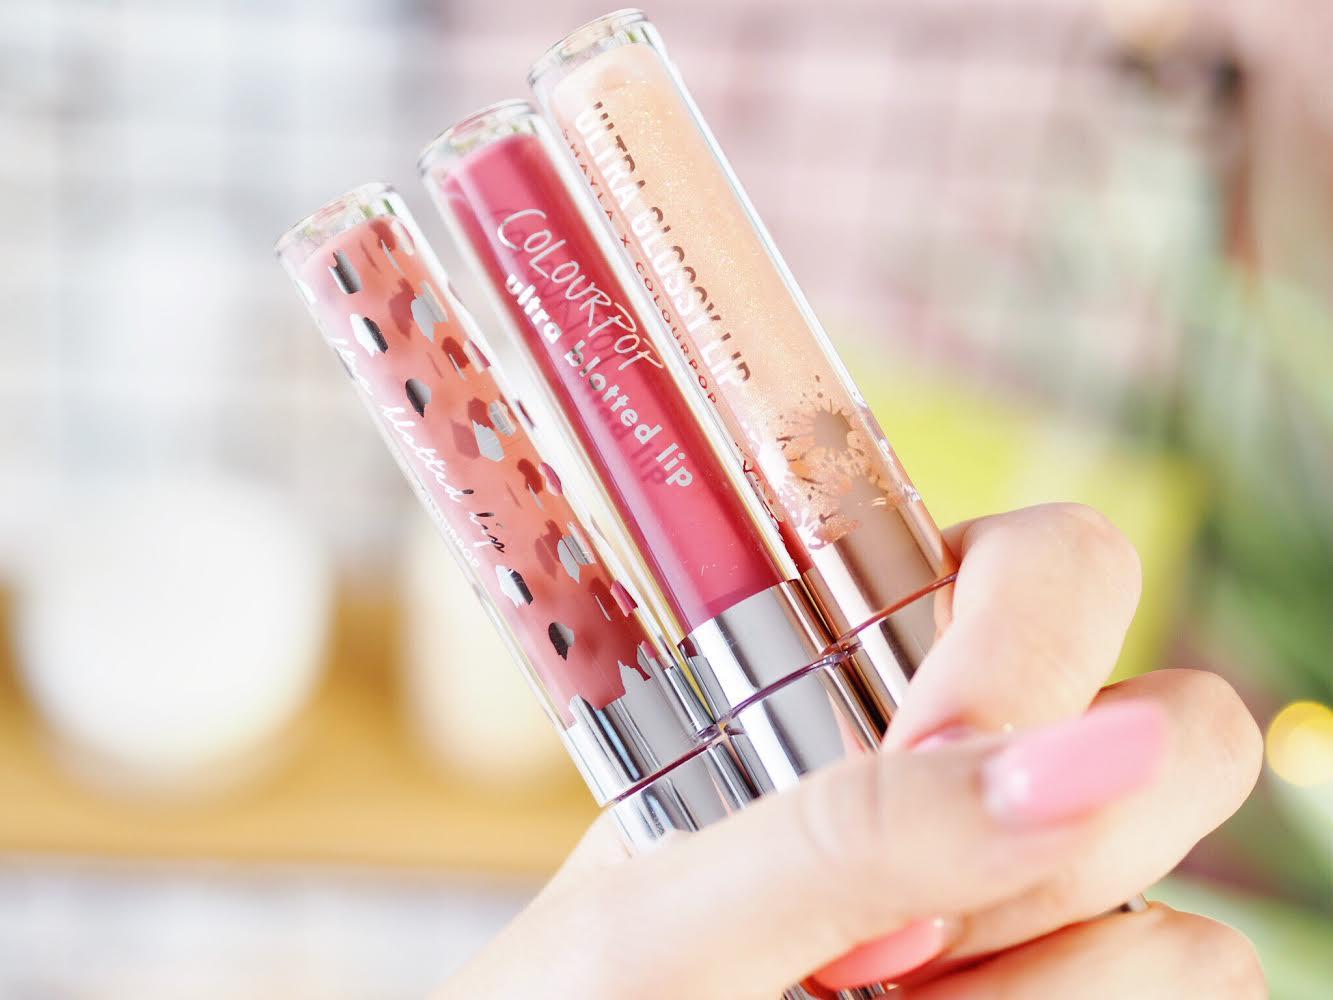 Shayla x Colourpop Ultra Glossy LiP